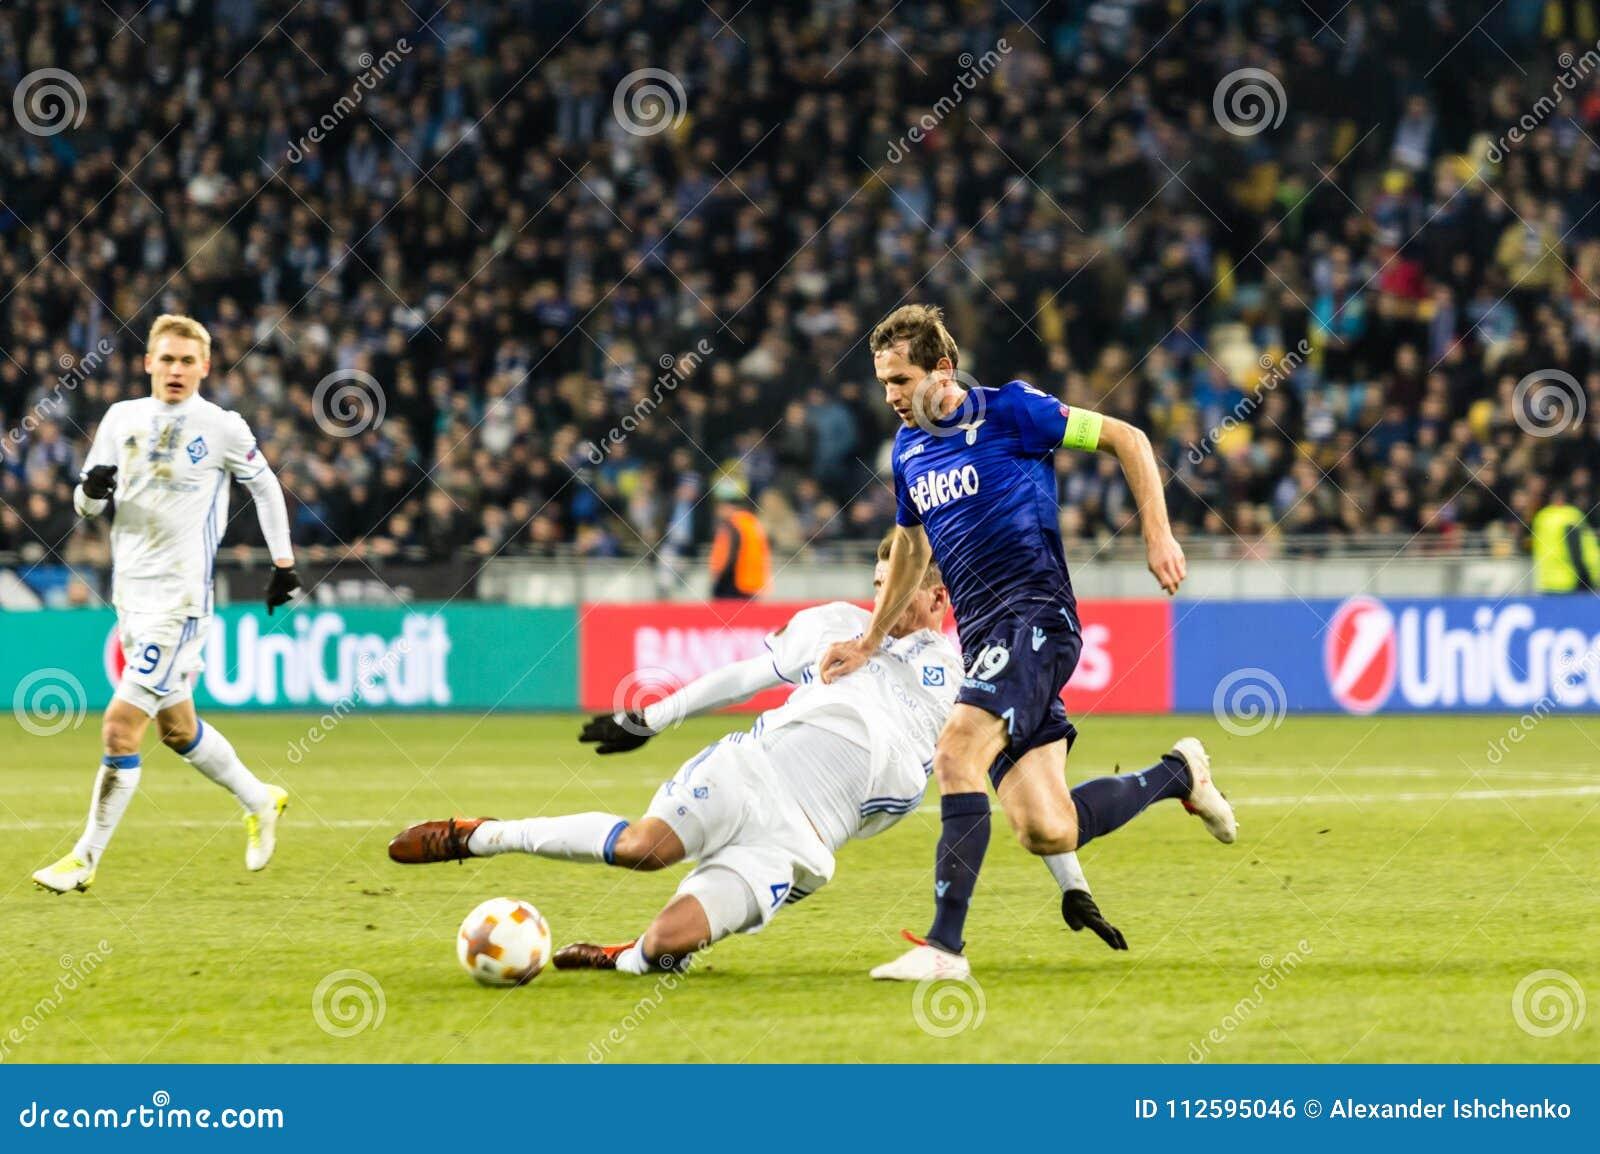 UEFA Europa League football match Dynamo Kyiv – Lazio, March 1